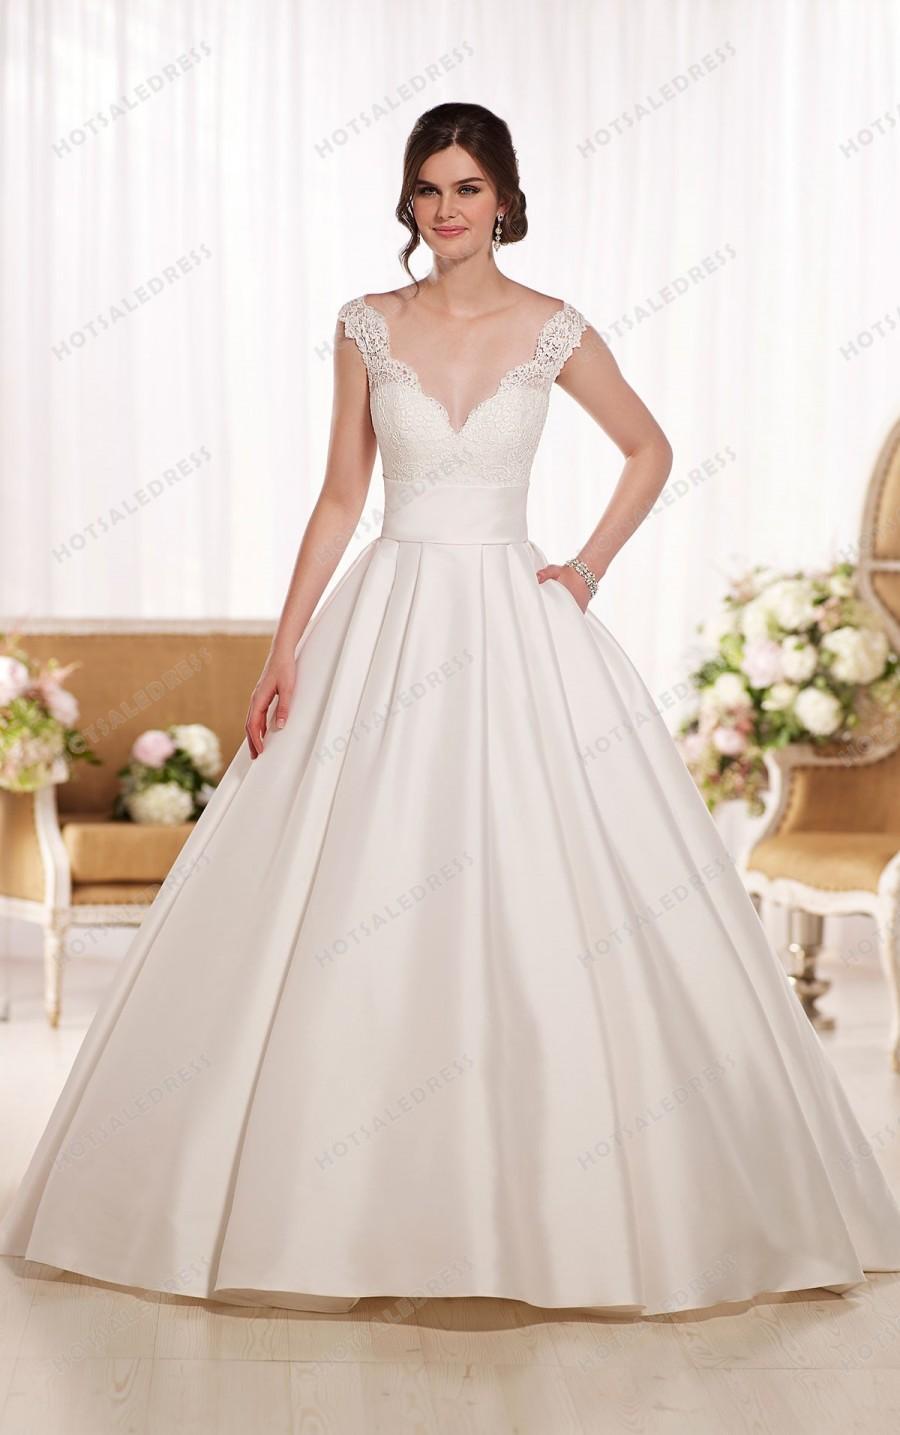 Essense Of Australia Wedding Dresses Ball Gown Style D1790 #2367844 ...